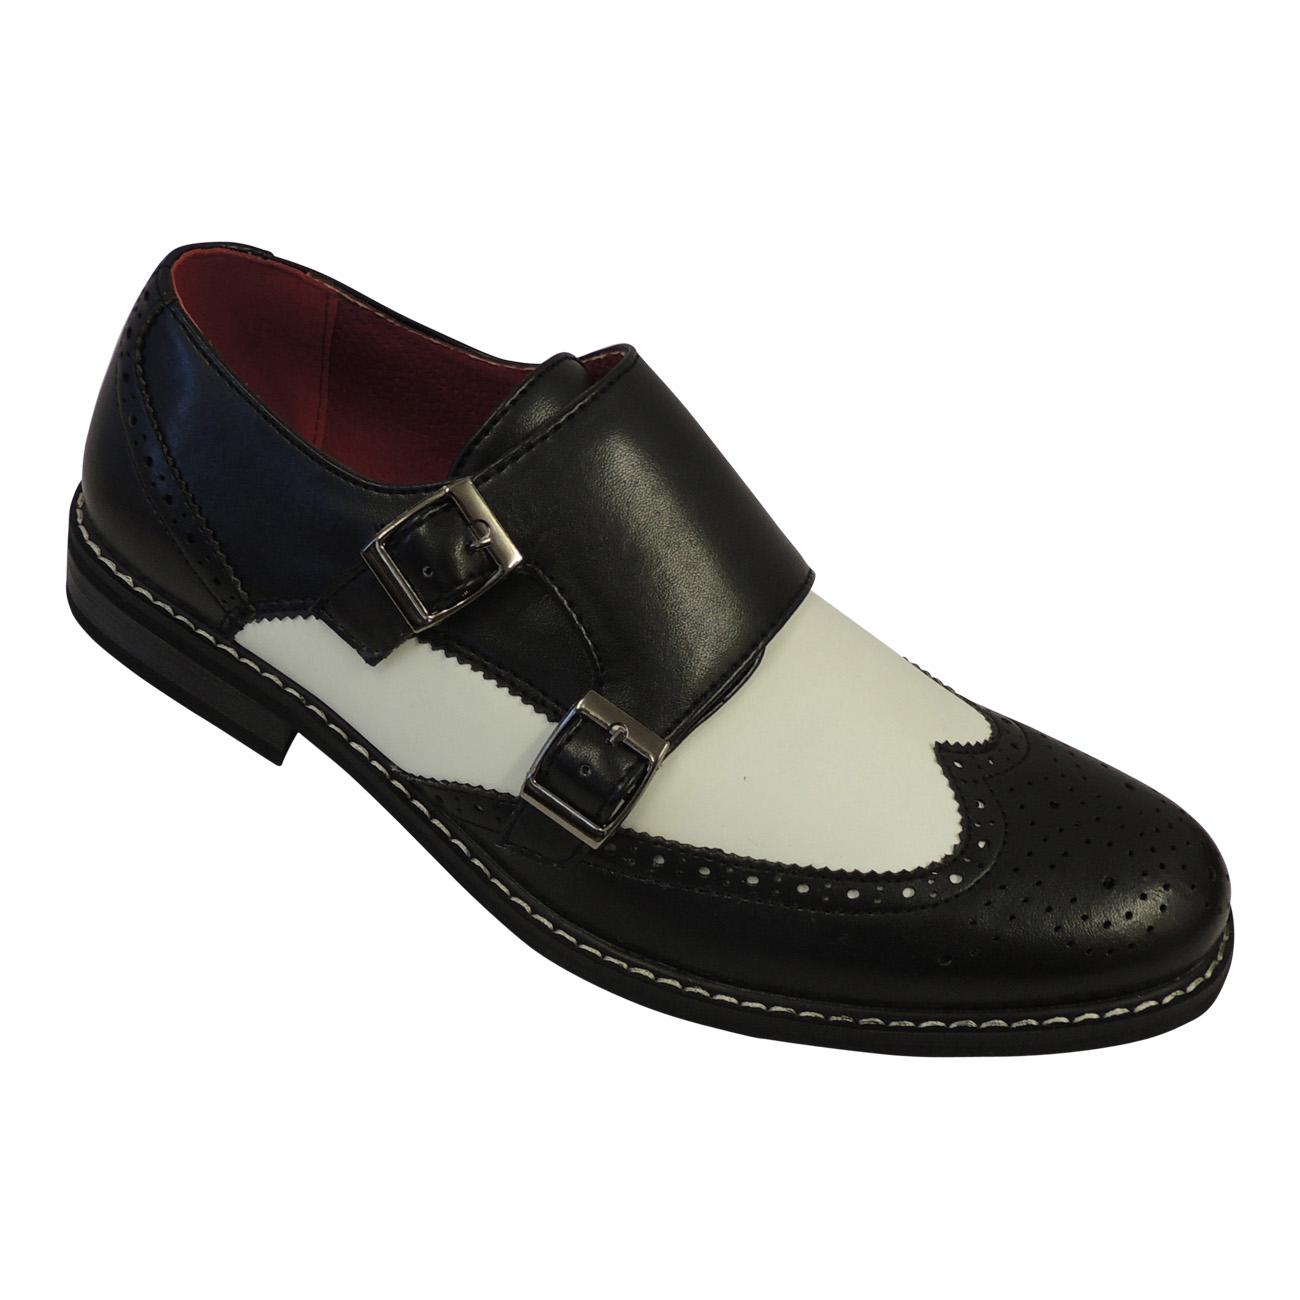 Mens Oxford Jazz Shoes Brown Ebay